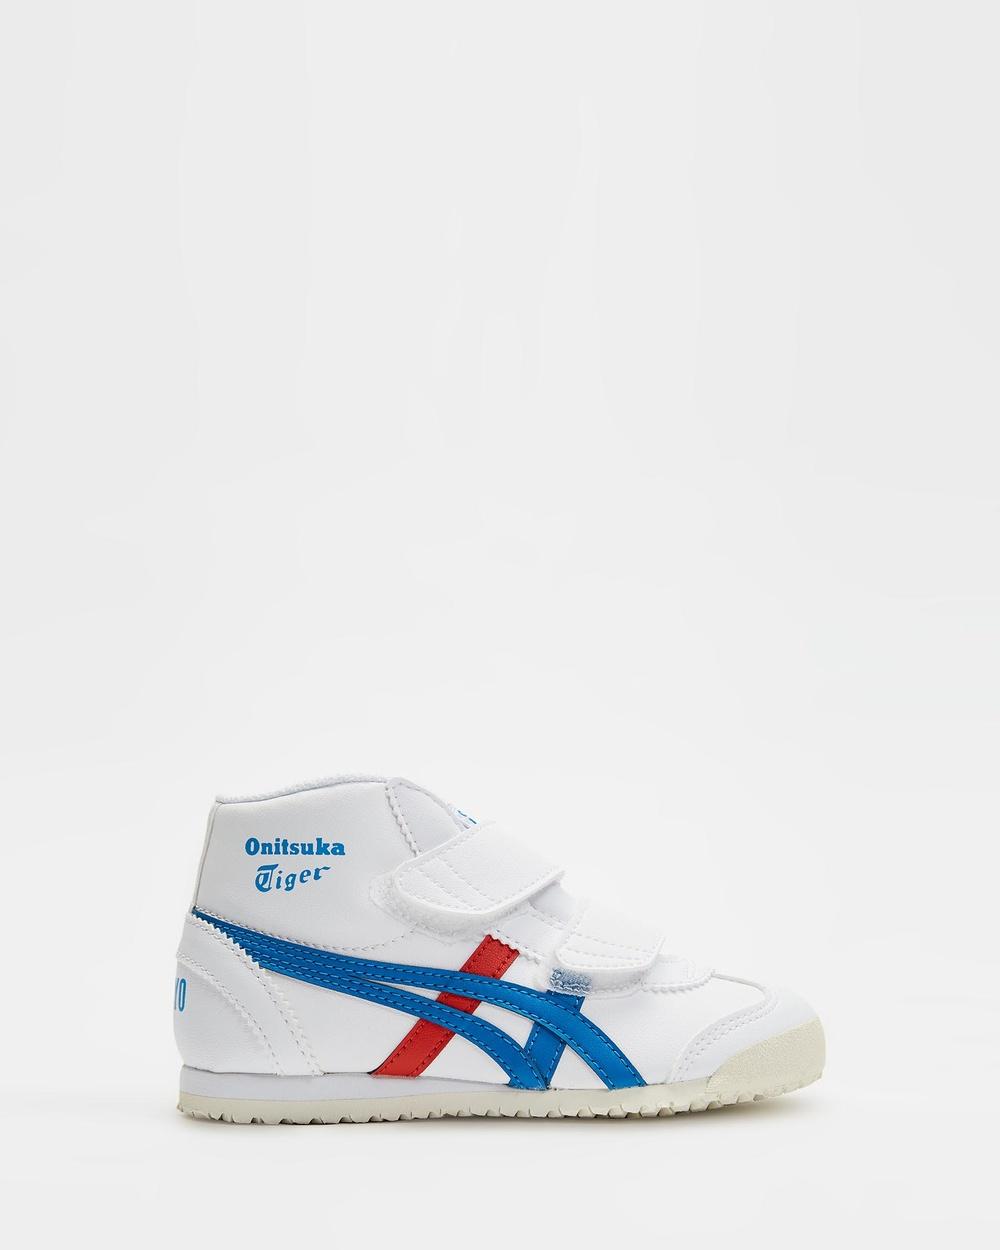 Onitsuka Tiger Mexico Mid Runner PS Kid's Sneakers White / Directoire Blue Mid-Runner Australia